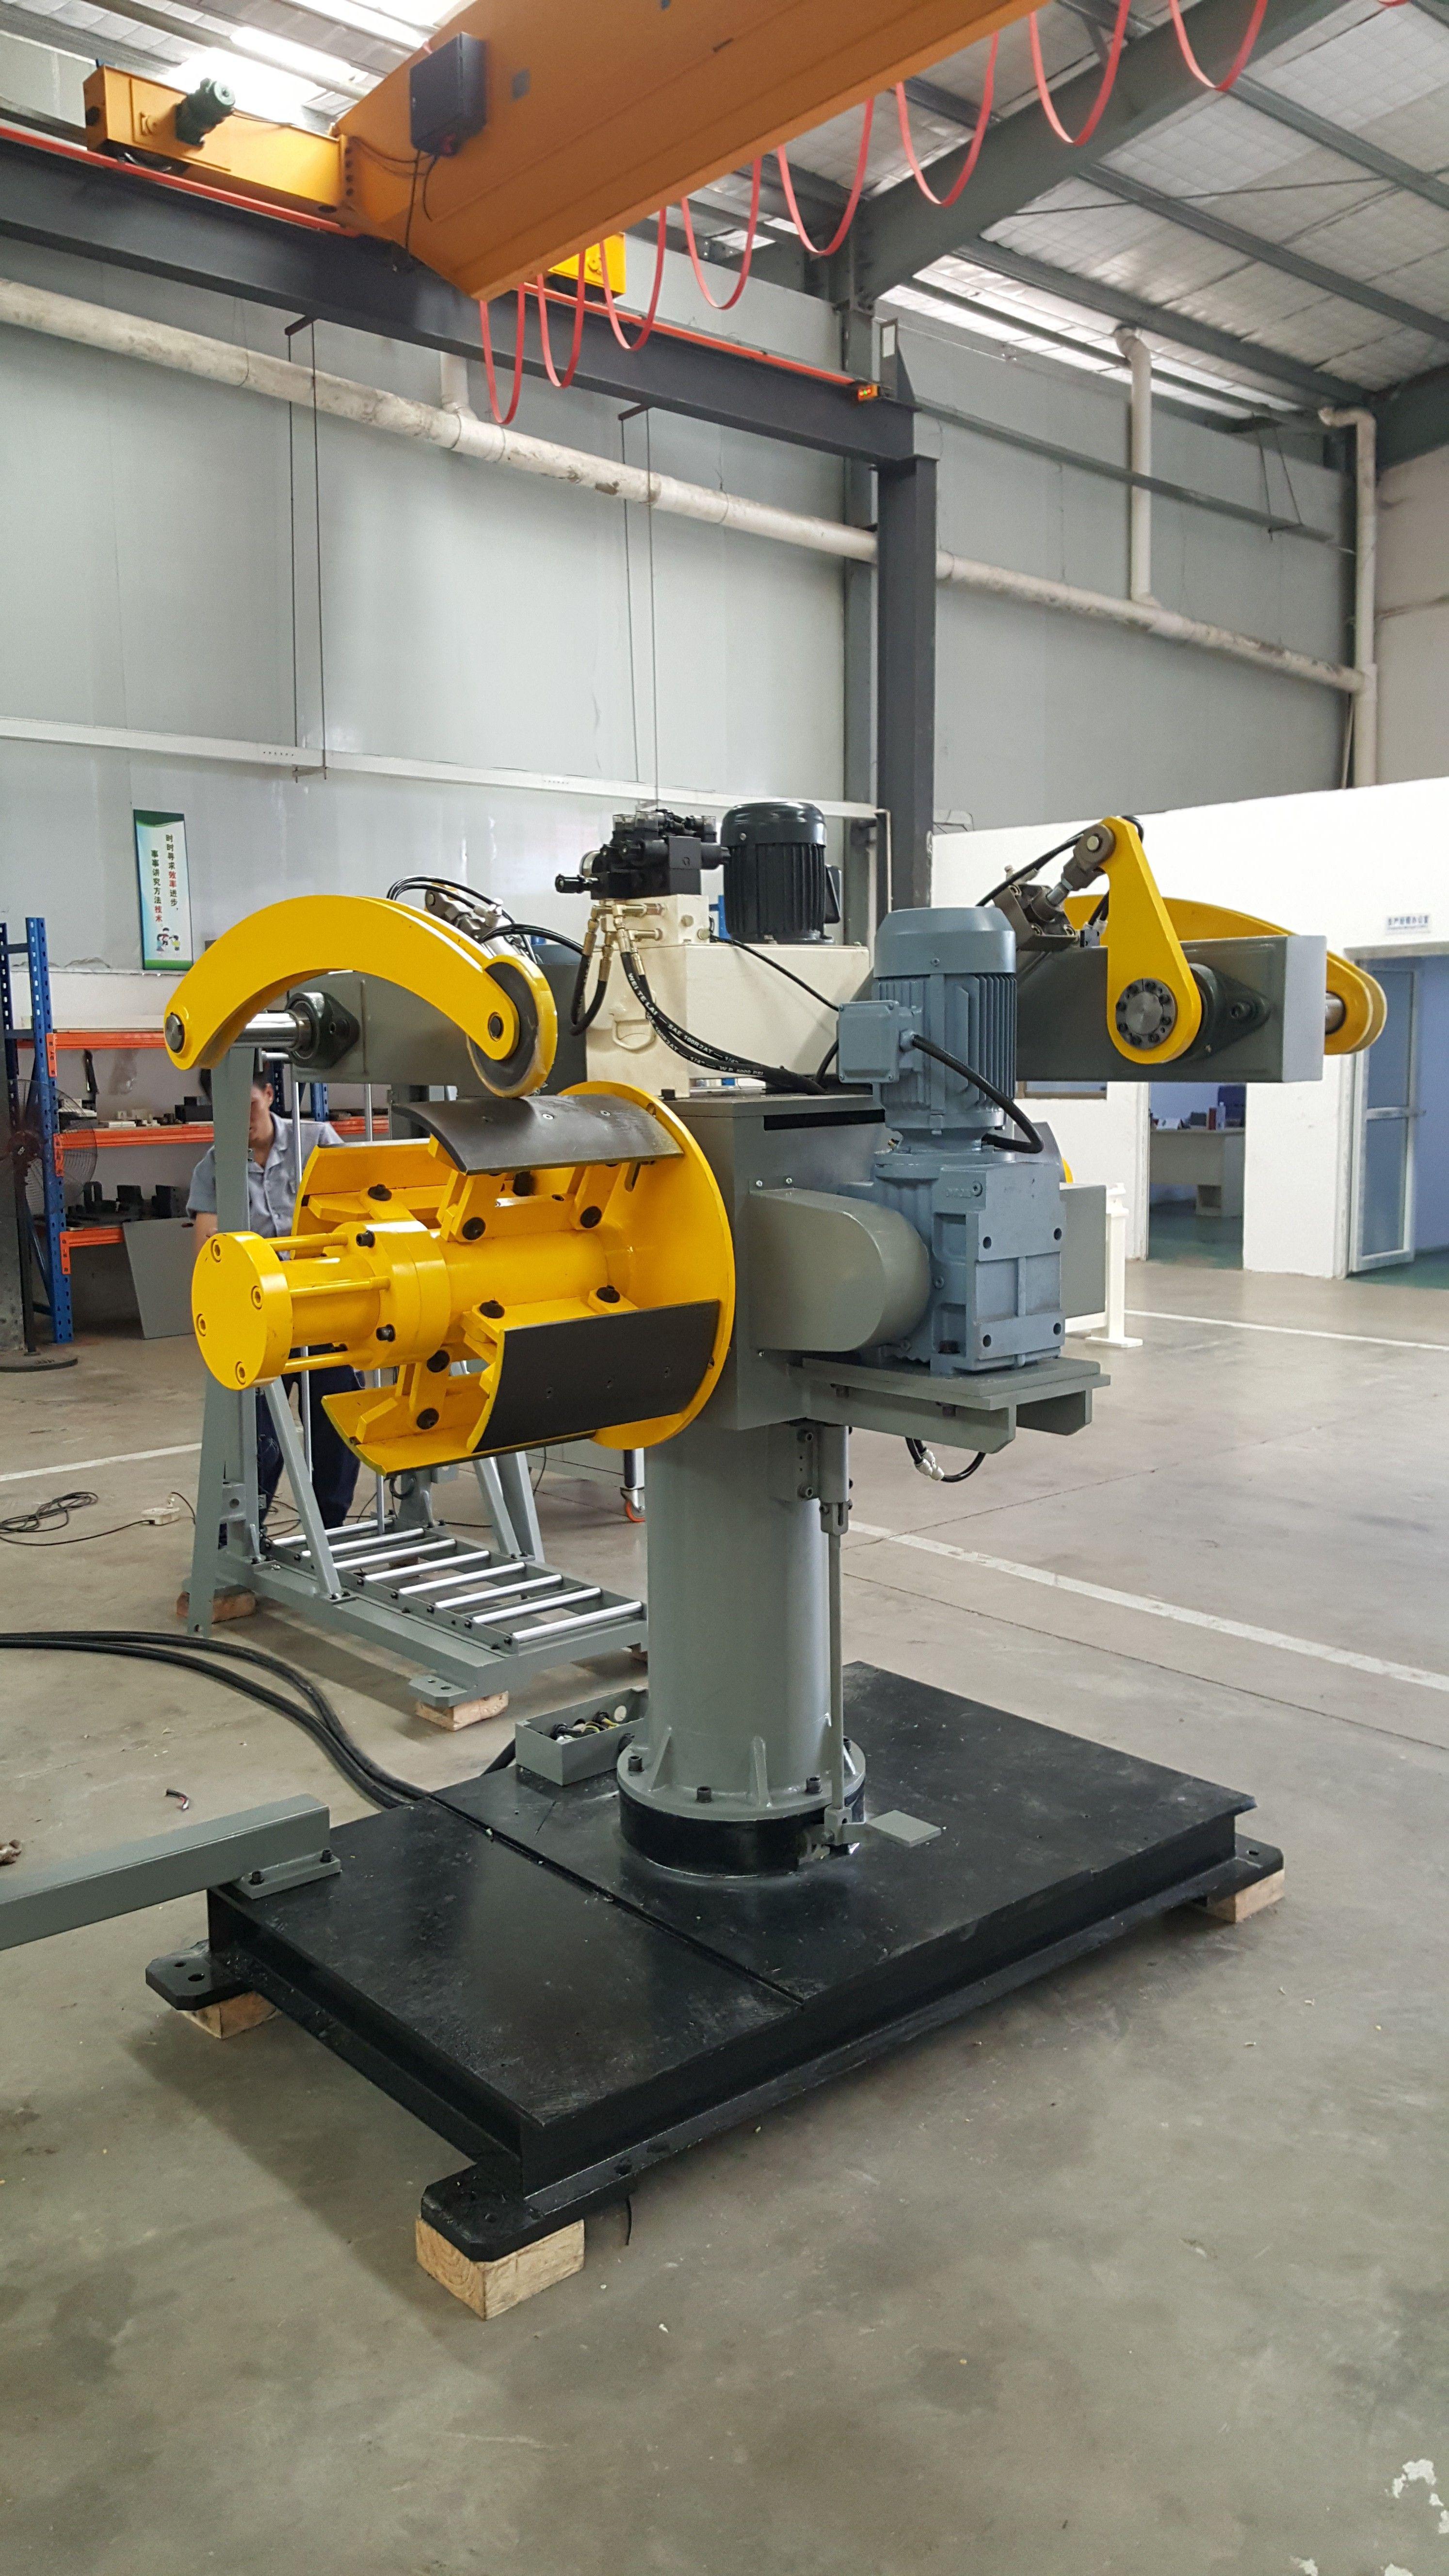 #metalpressings #precisionstampings #metalprocessing #coilfeeder #decoiler  Double Heads Decoiler Machine